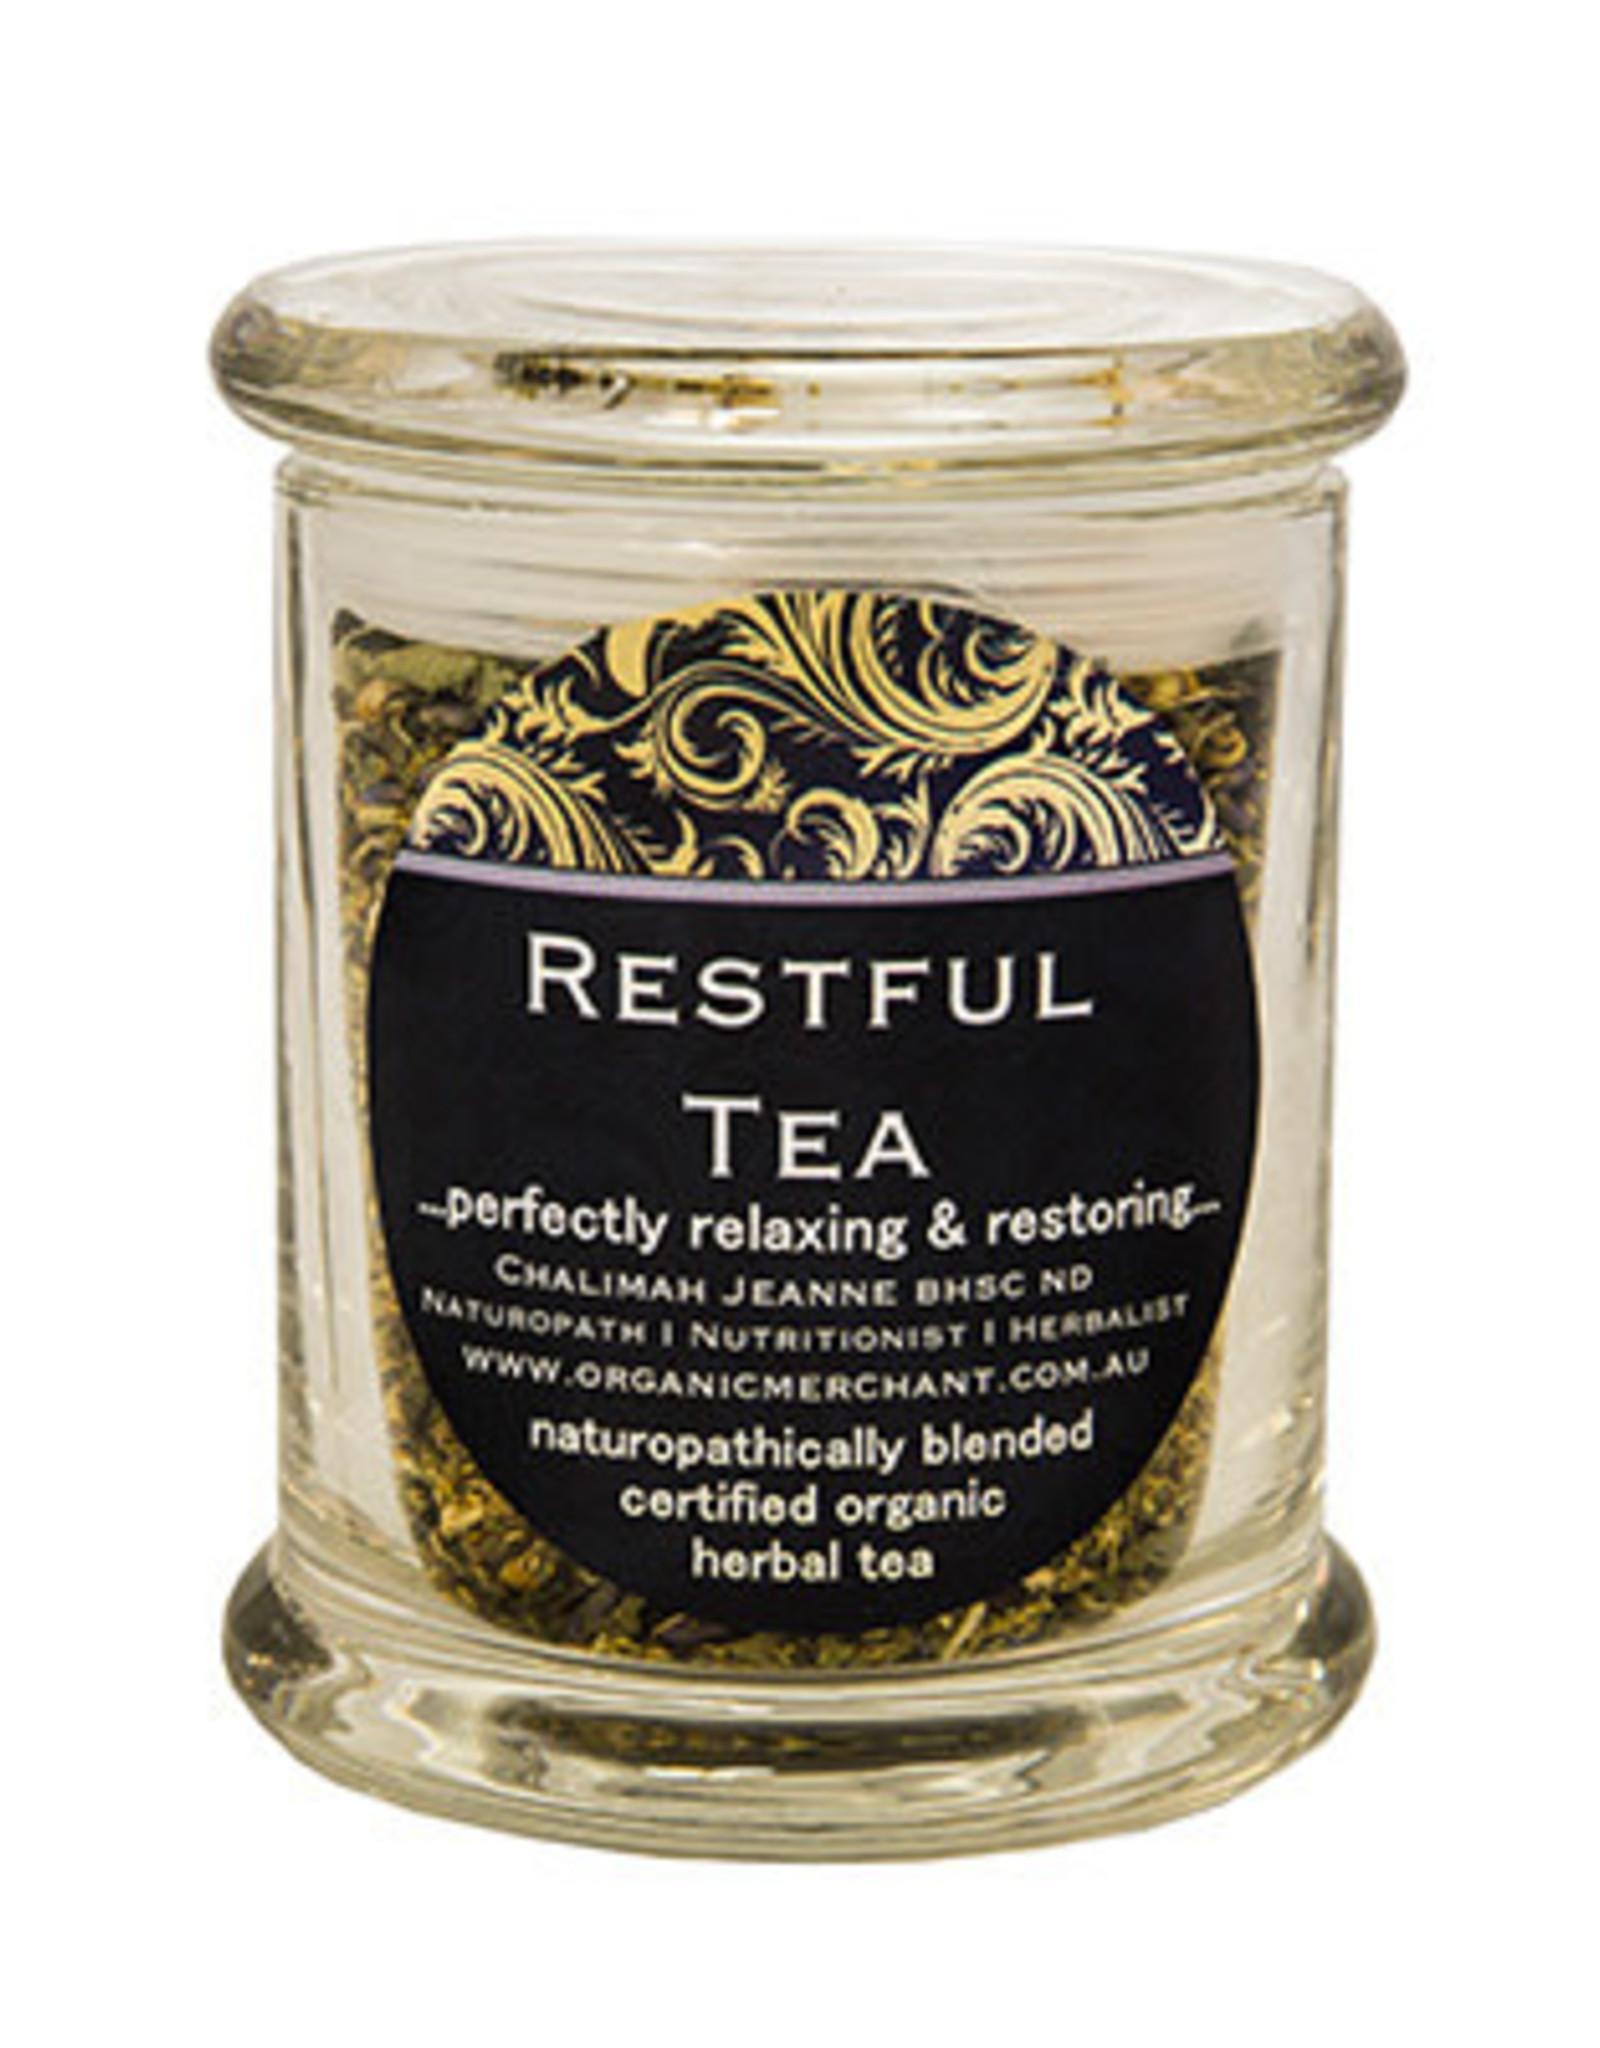 Organic Merchant Restful Tea 80g